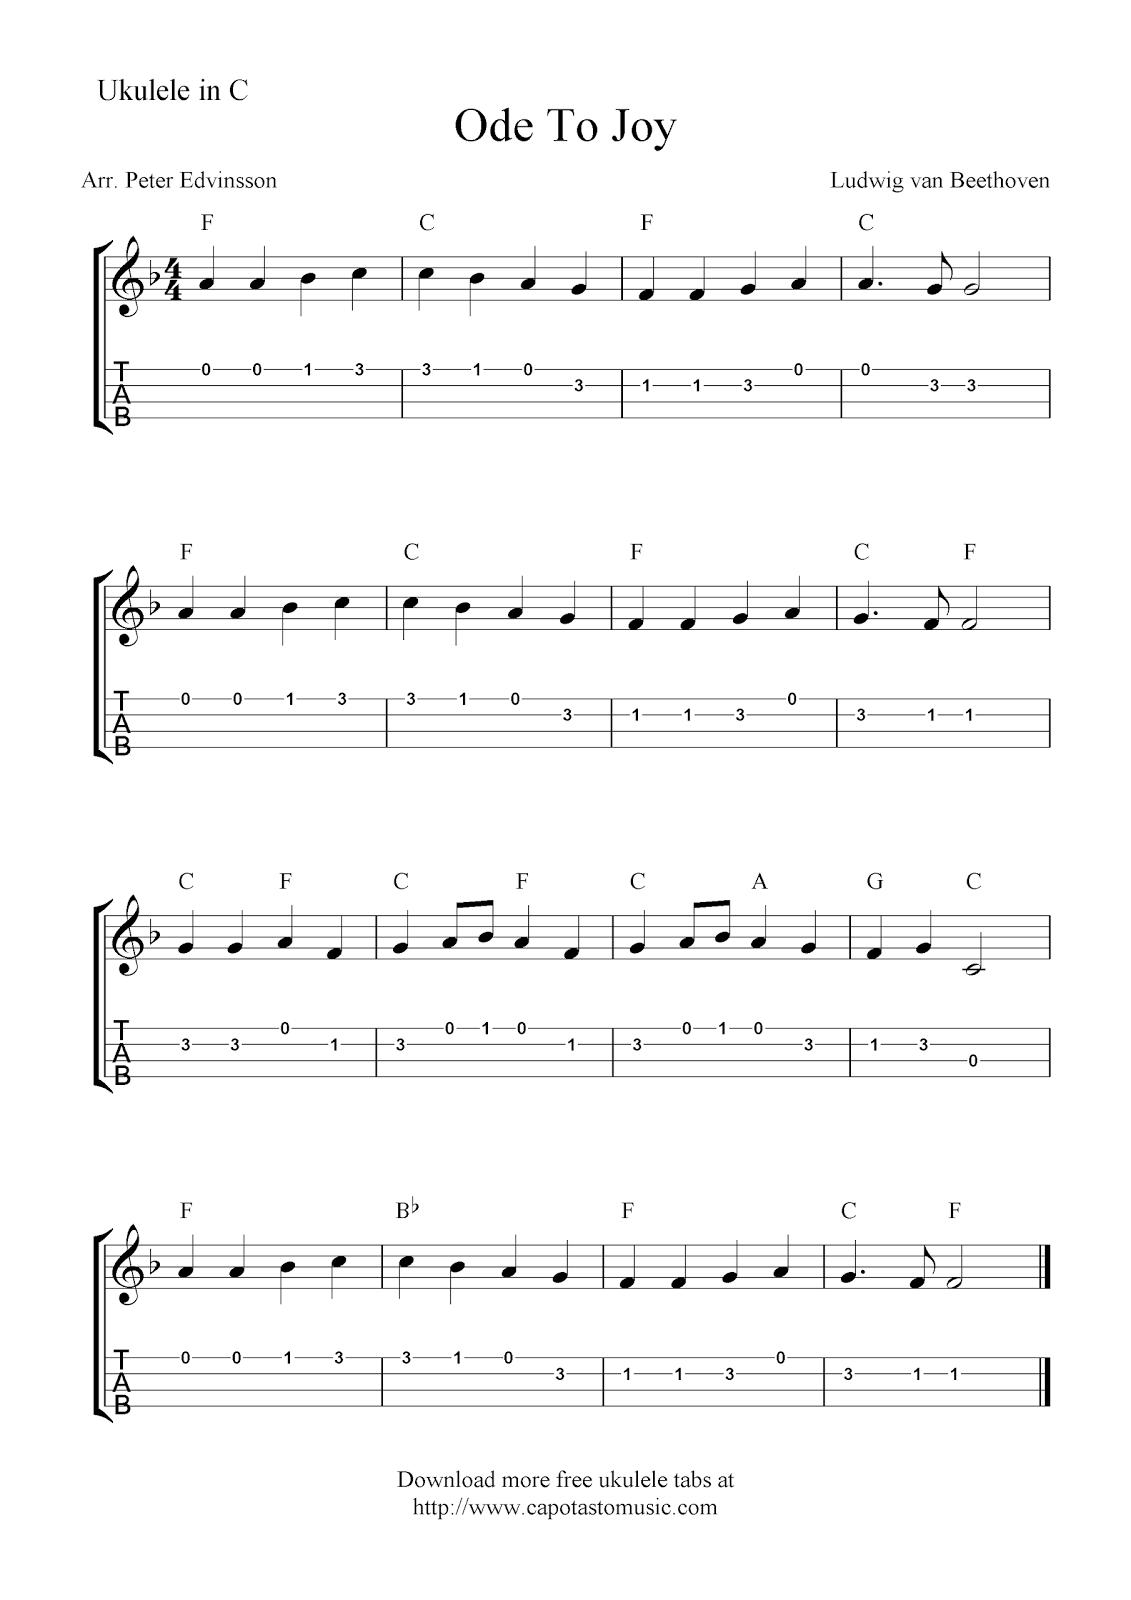 Free Sheet Music Scores Ode To Joy Free Ukulele Tab